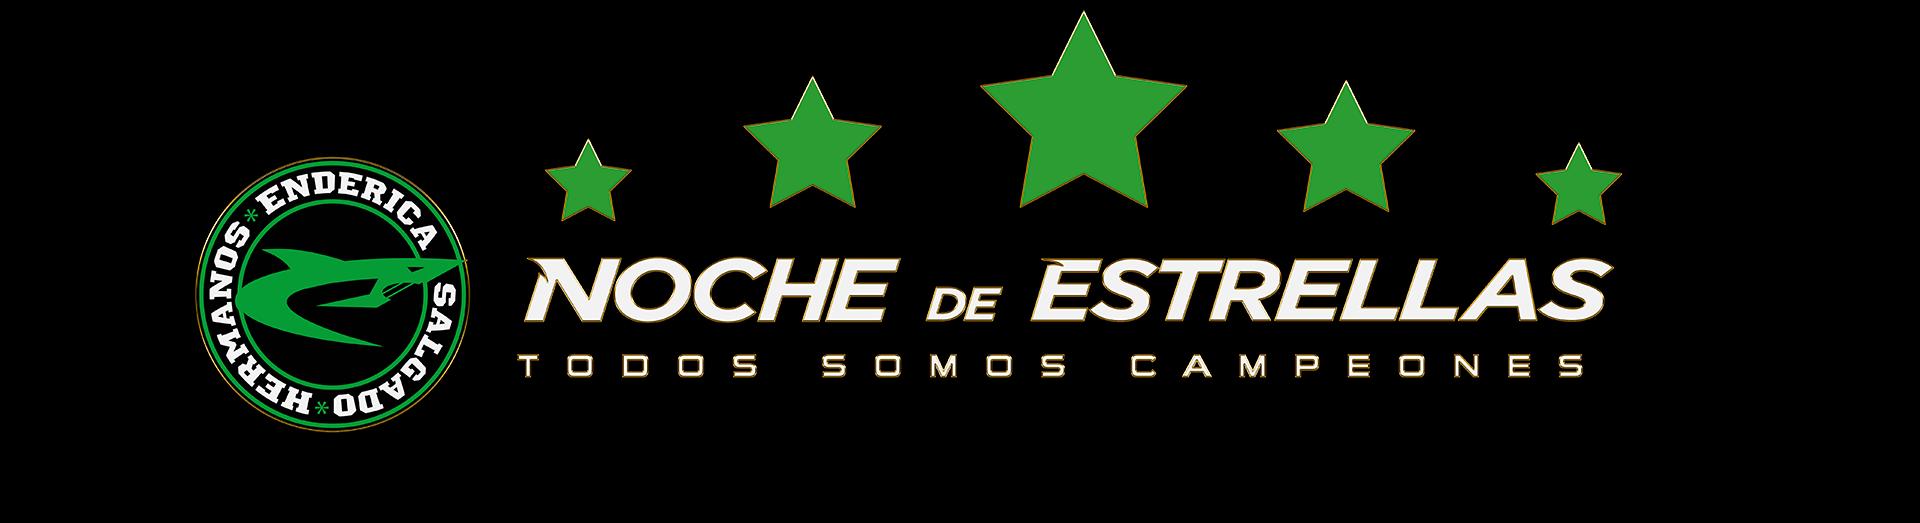 http://www.hermanosenderica.com/wp-content/uploads/2019/07/noche-de-estrellas-gold6.png